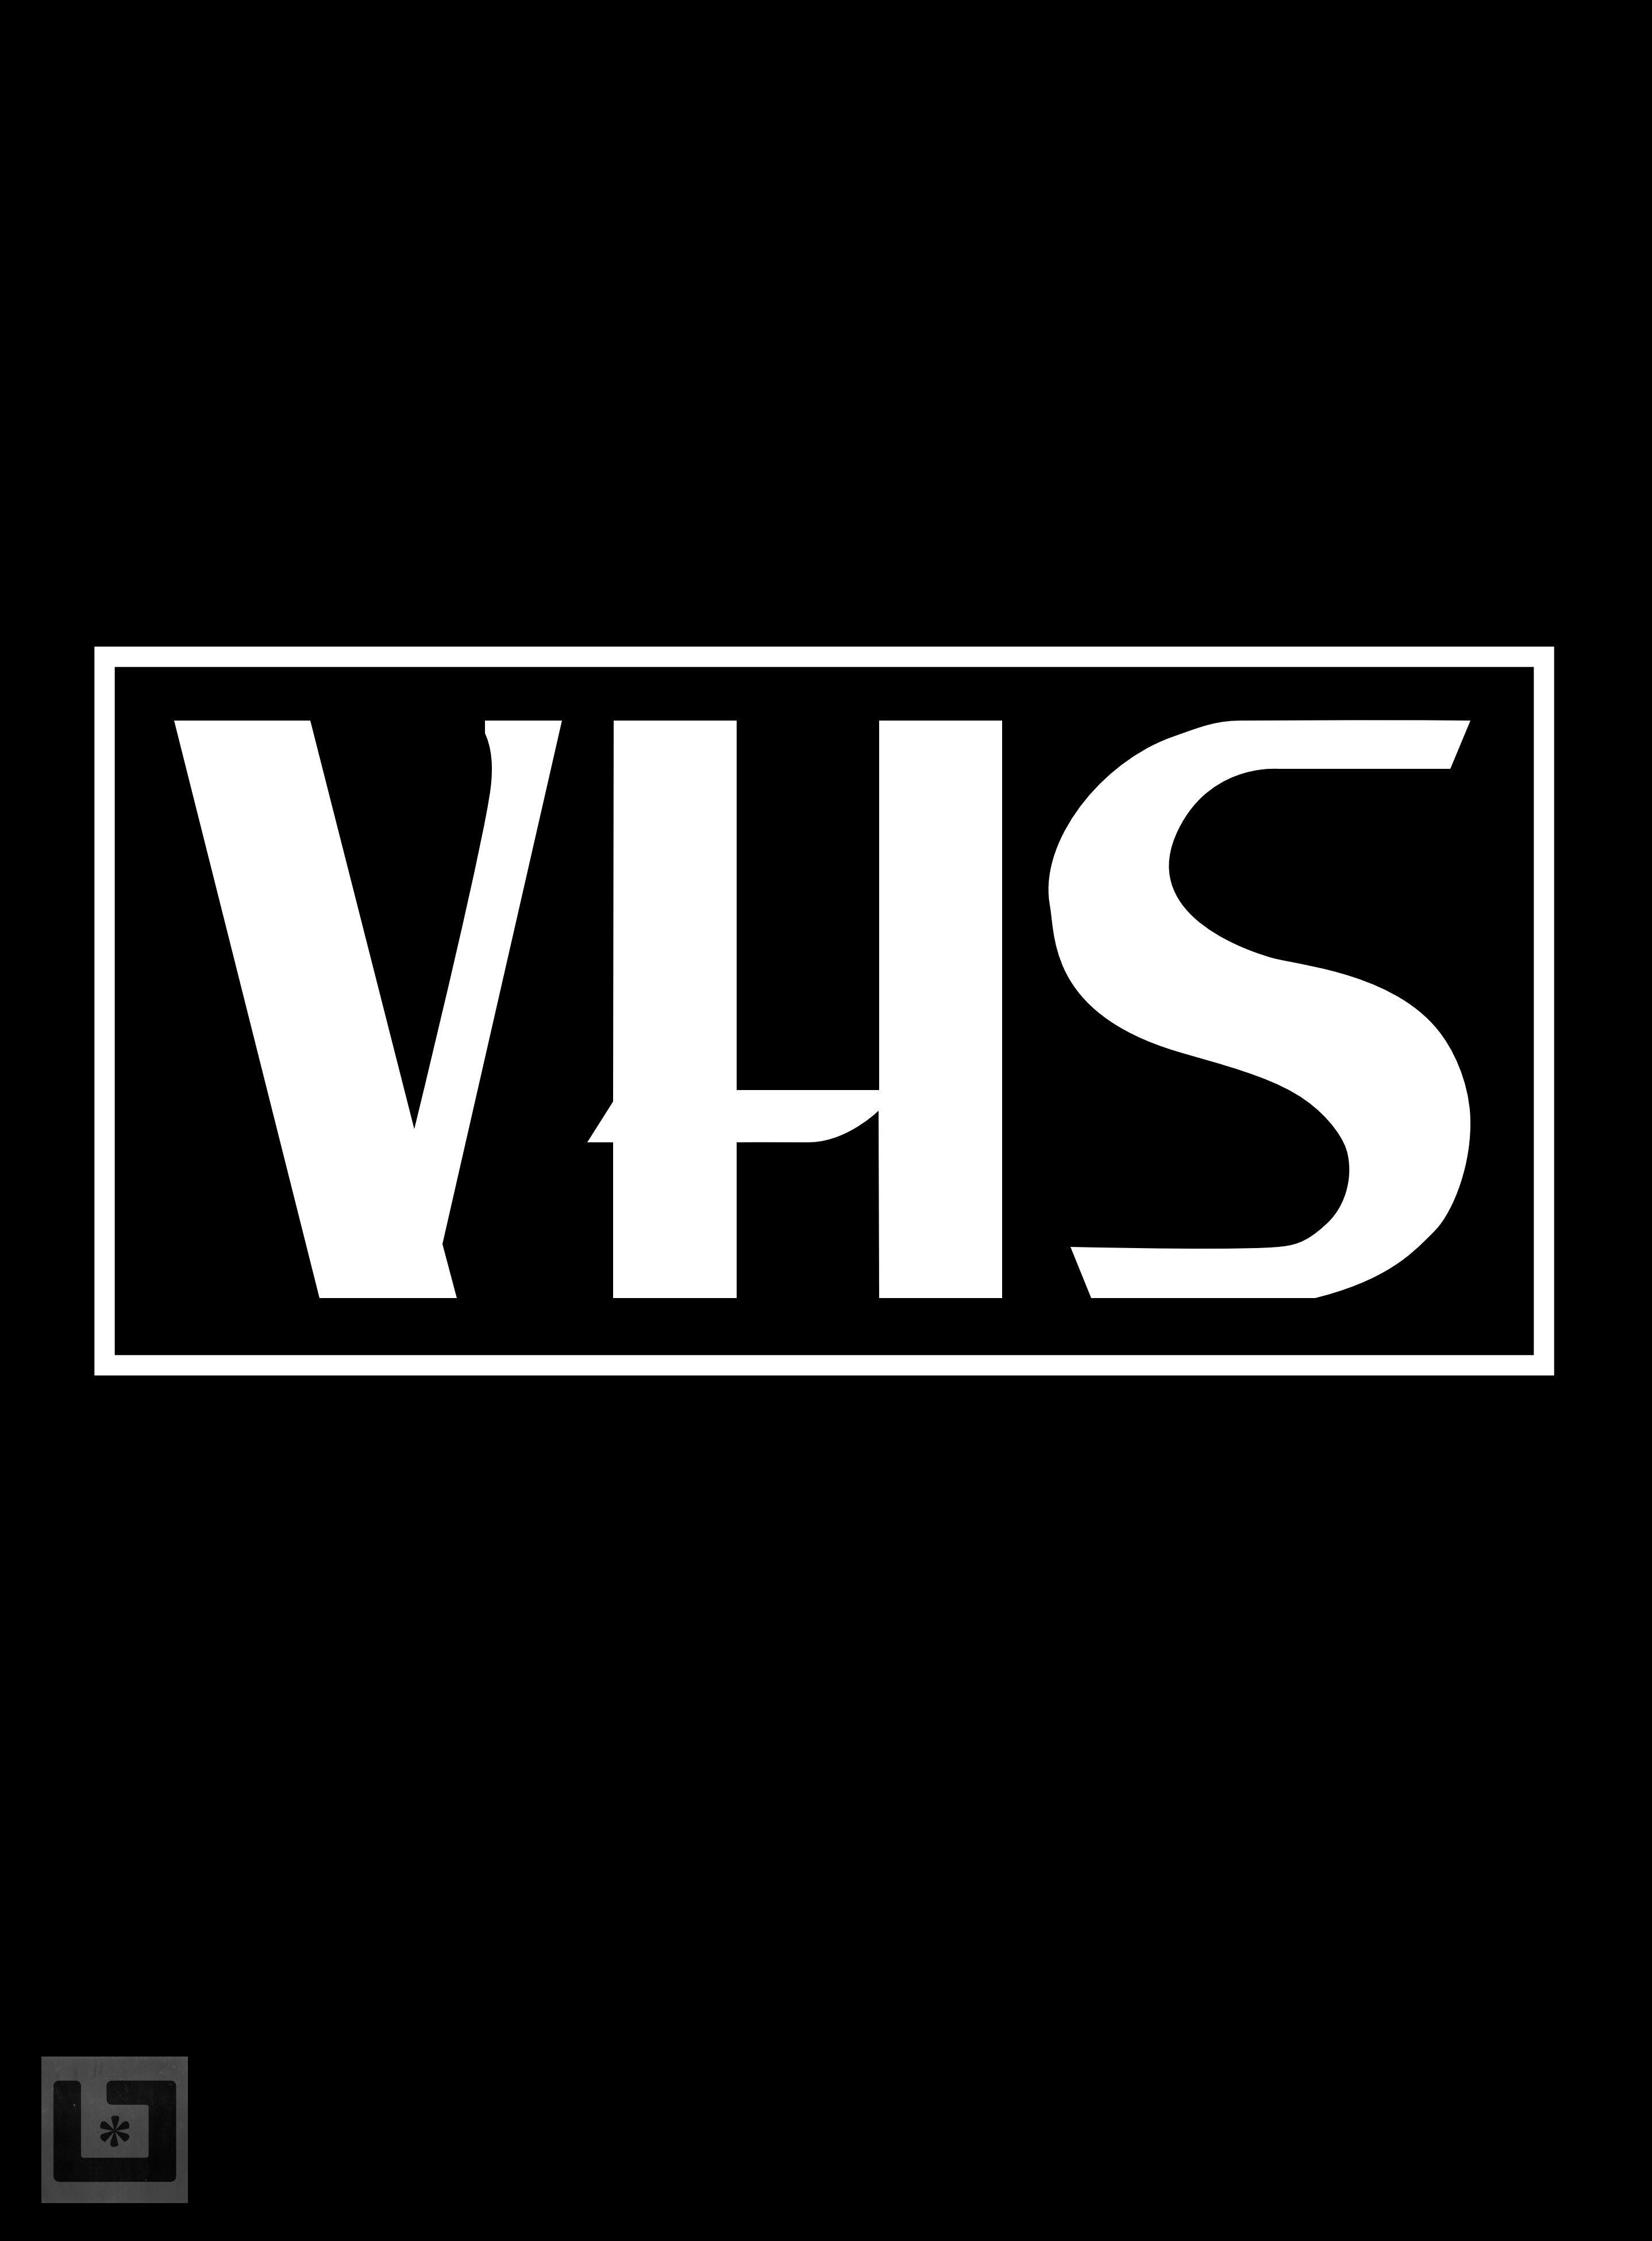 Vhs Logo Recreated By Logocryo Vhs Picture Logo Logos